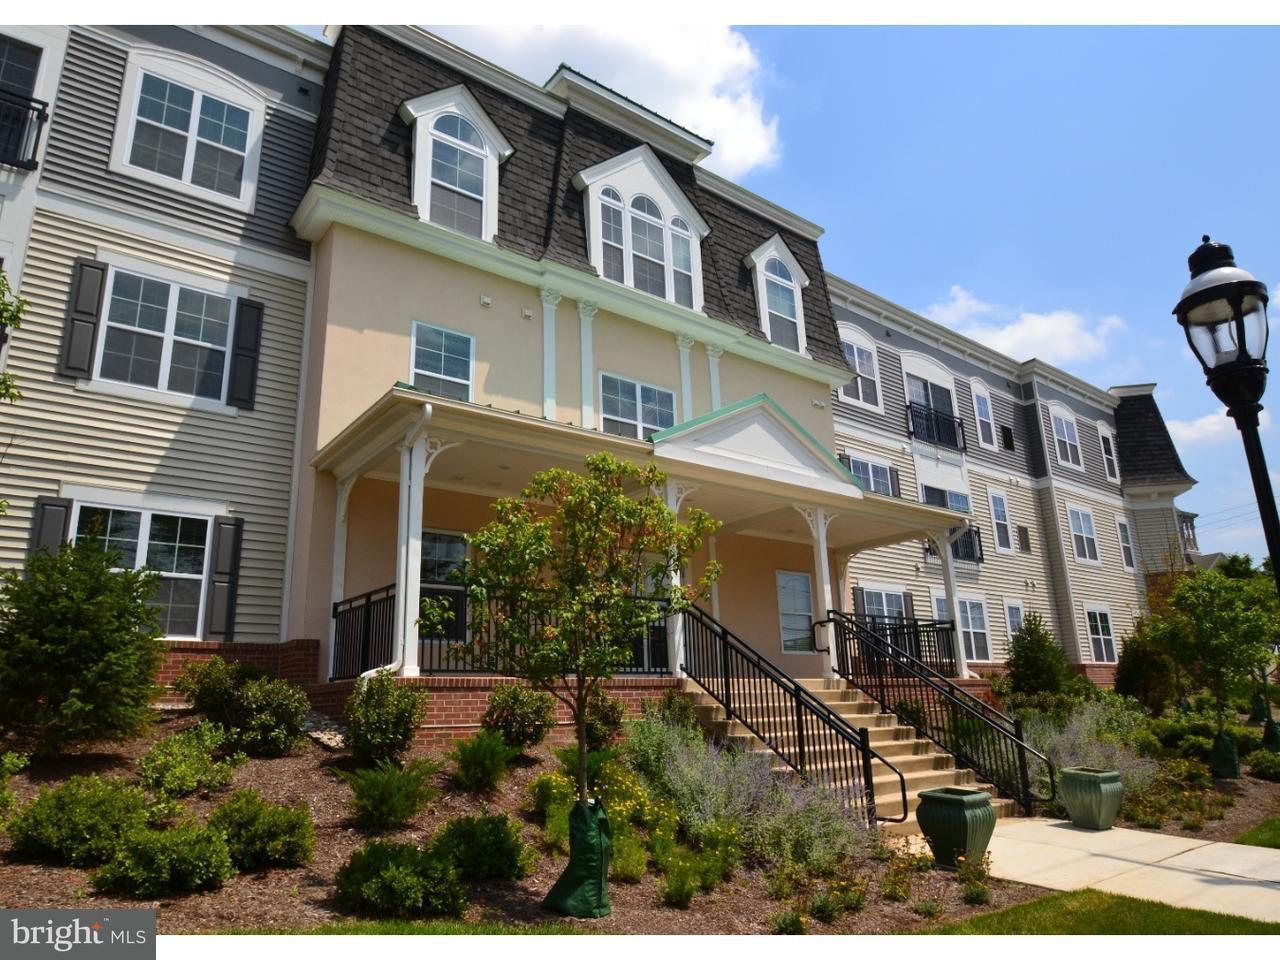 独户住宅 为 出租 在 131 N MAIN ST #9 Chalfont, 宾夕法尼亚州 18914 美国